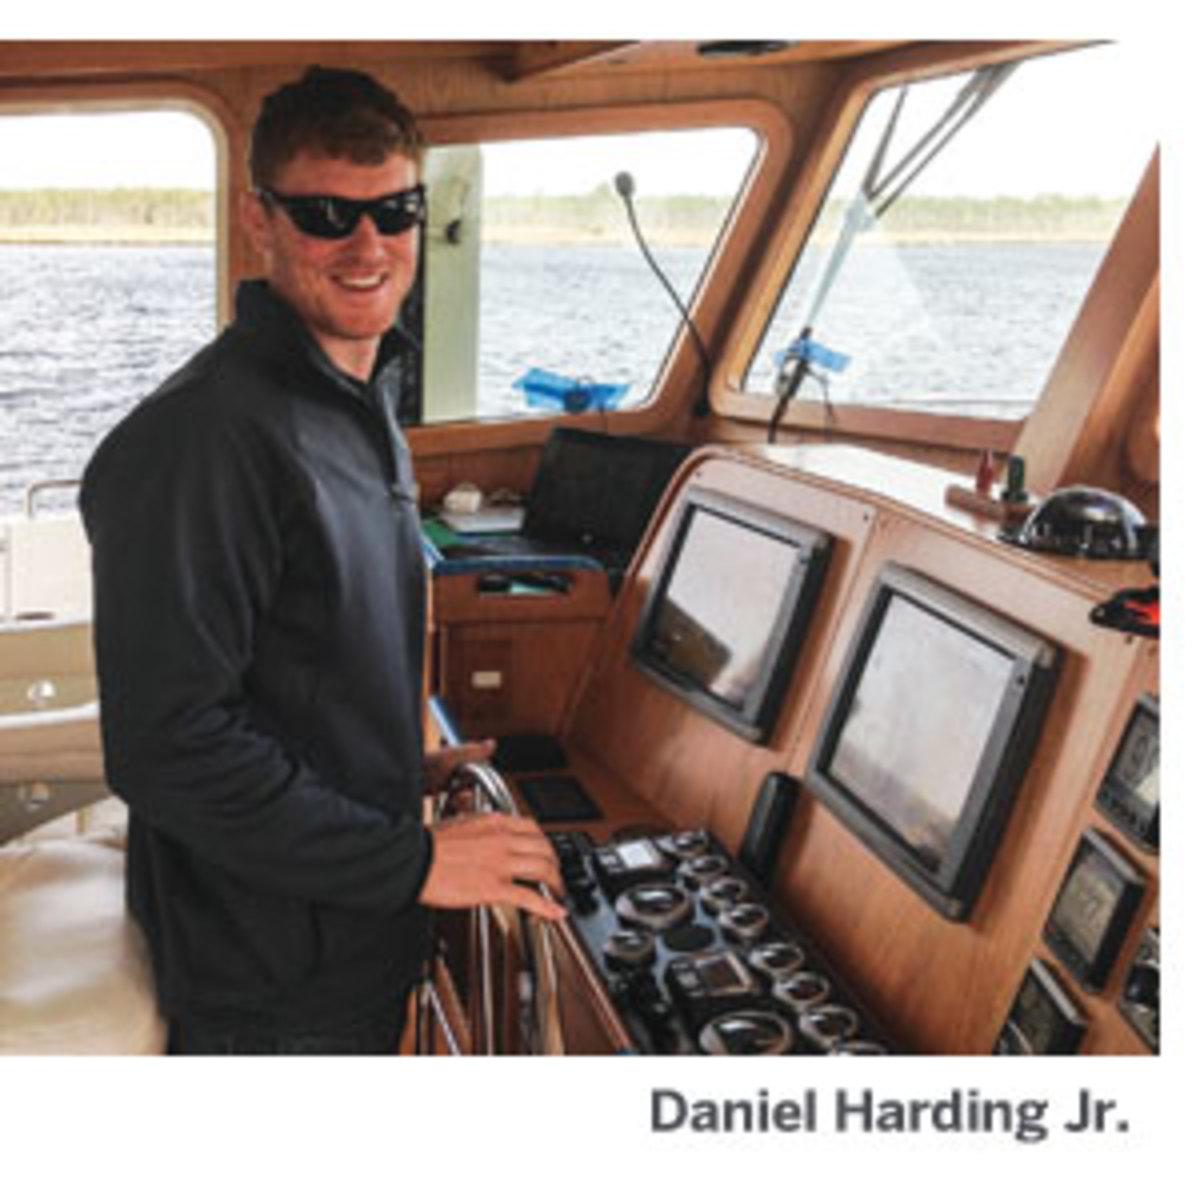 Daniel Harding Jr.